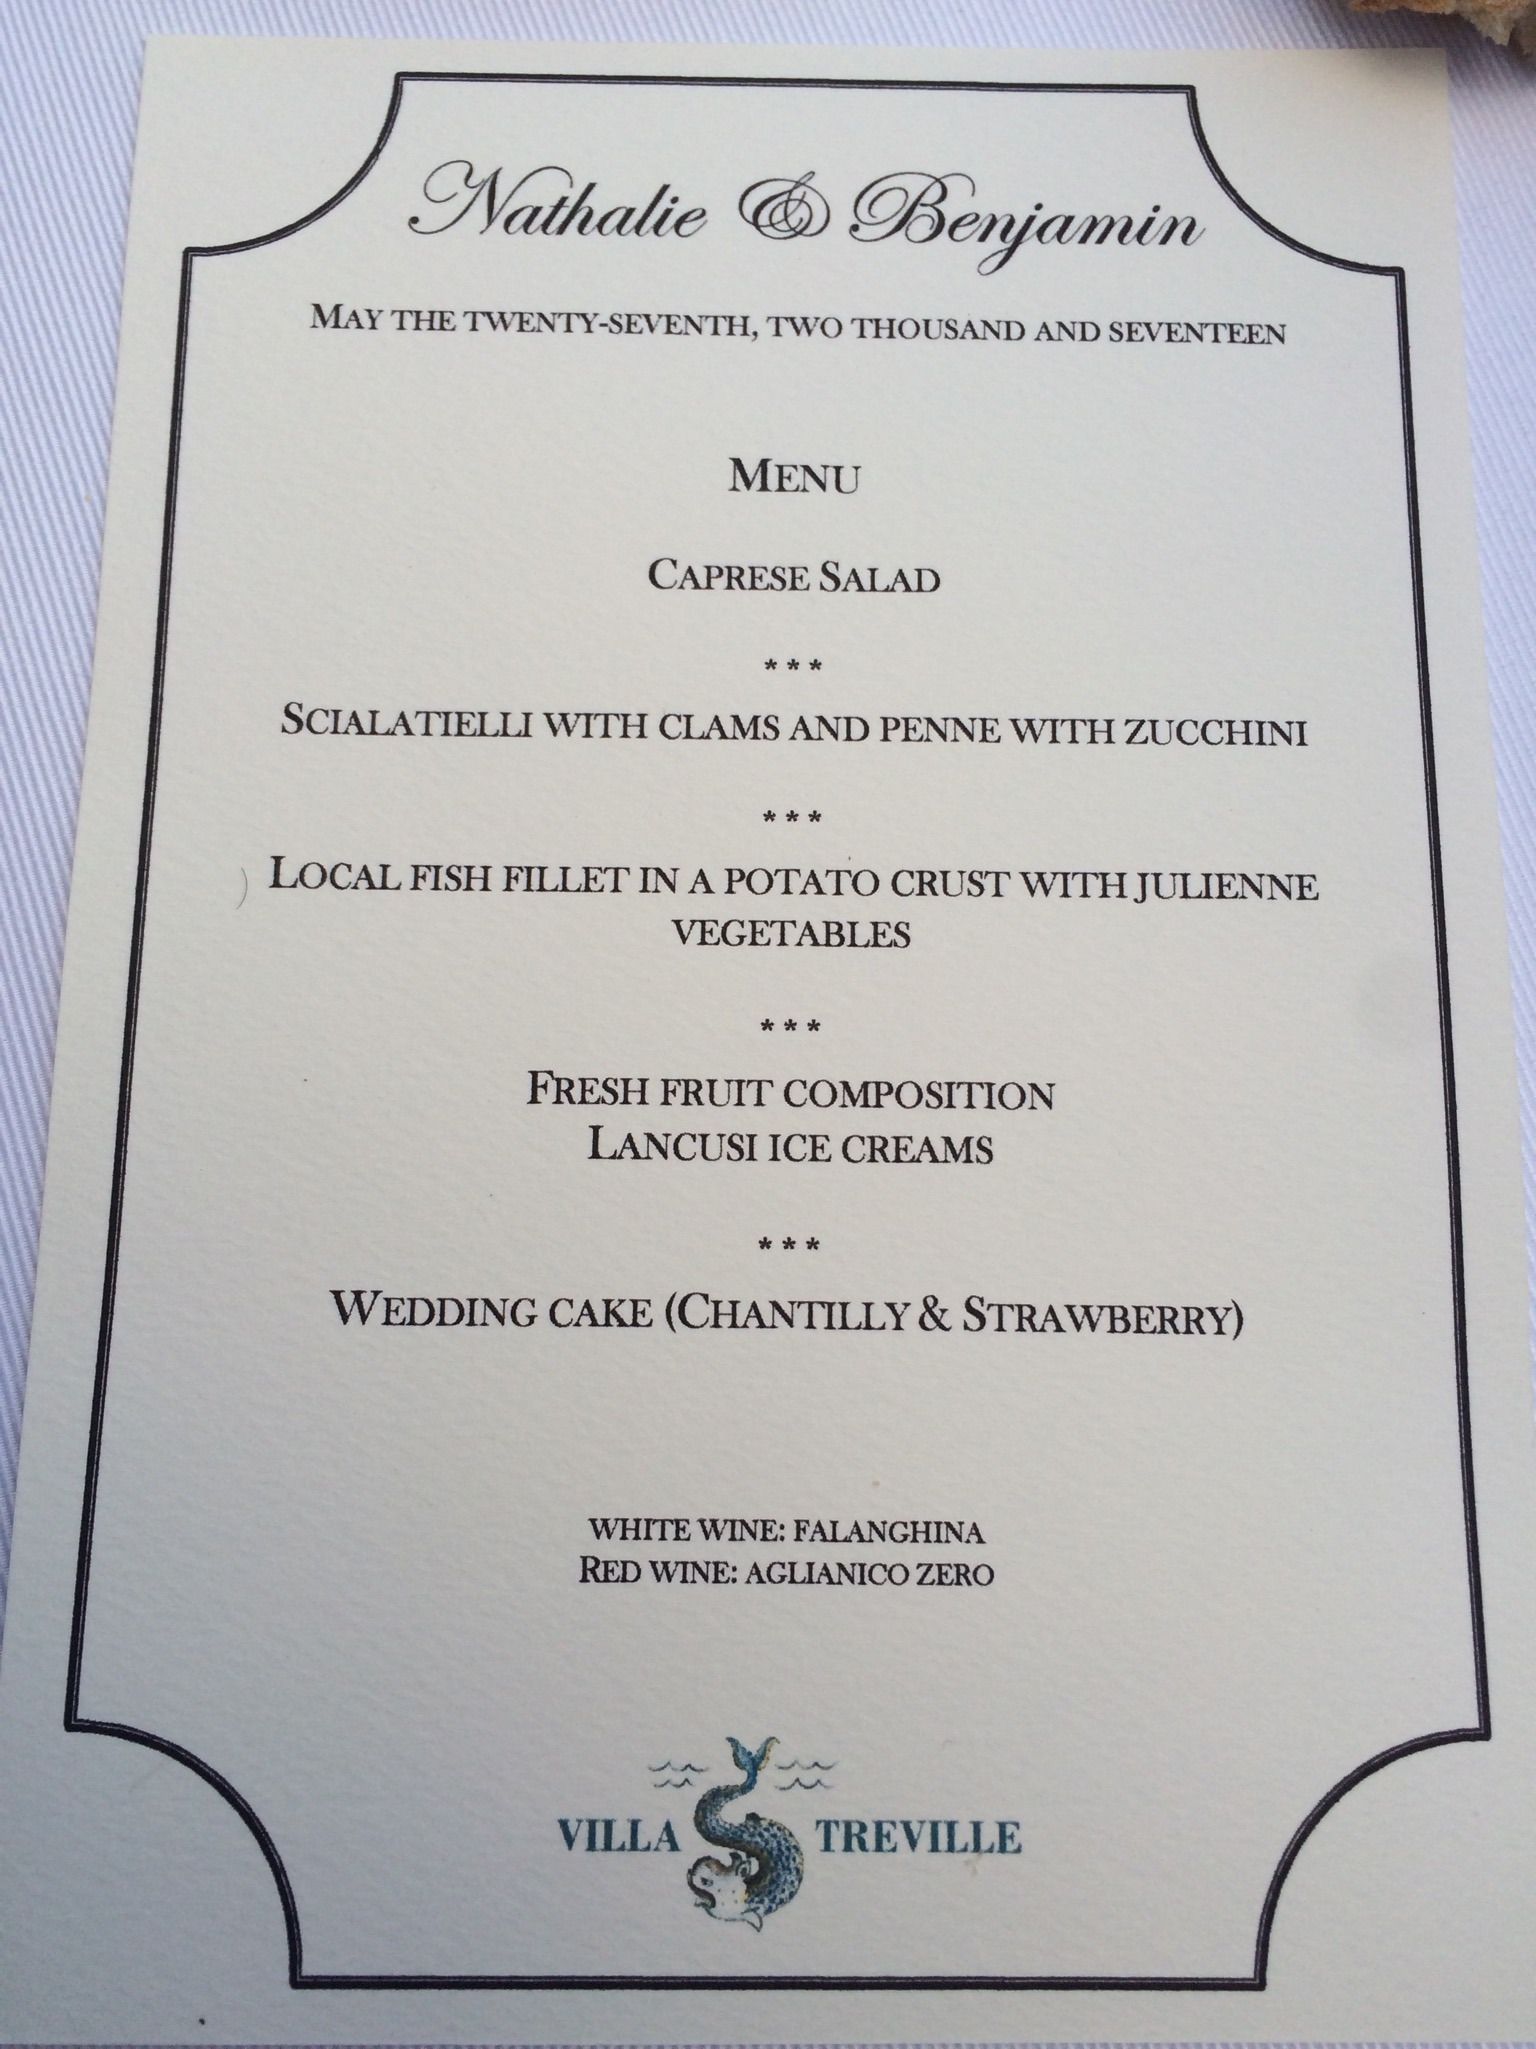 https://www.weddingamalfi.com/wp-content/uploads/Wedding-Menu-Nathalie-Benjamin.jpg